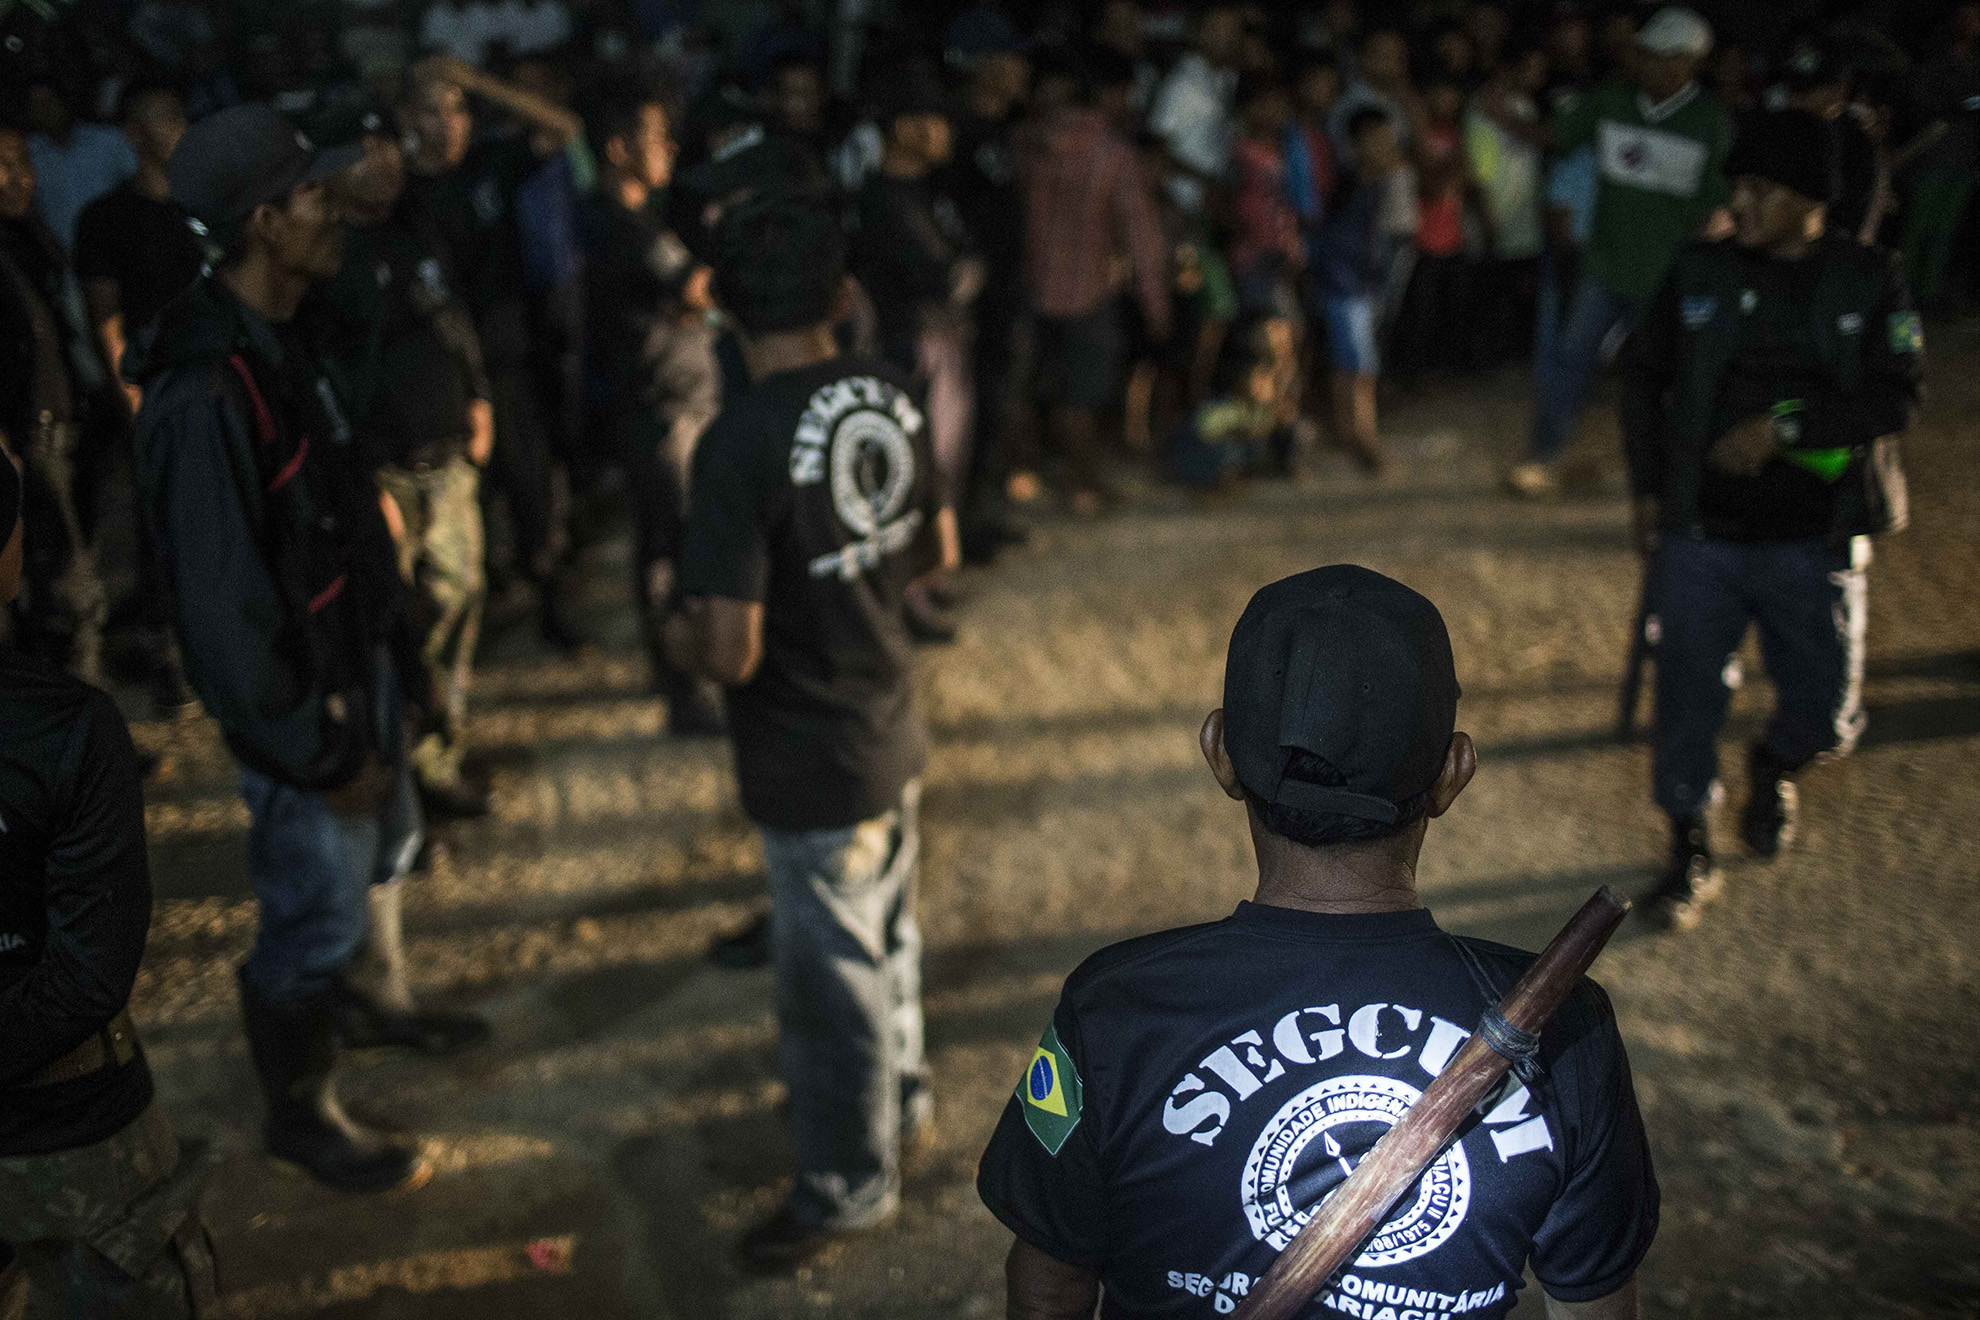 A volta da polícia indígena Ticuna no Alto Solimões